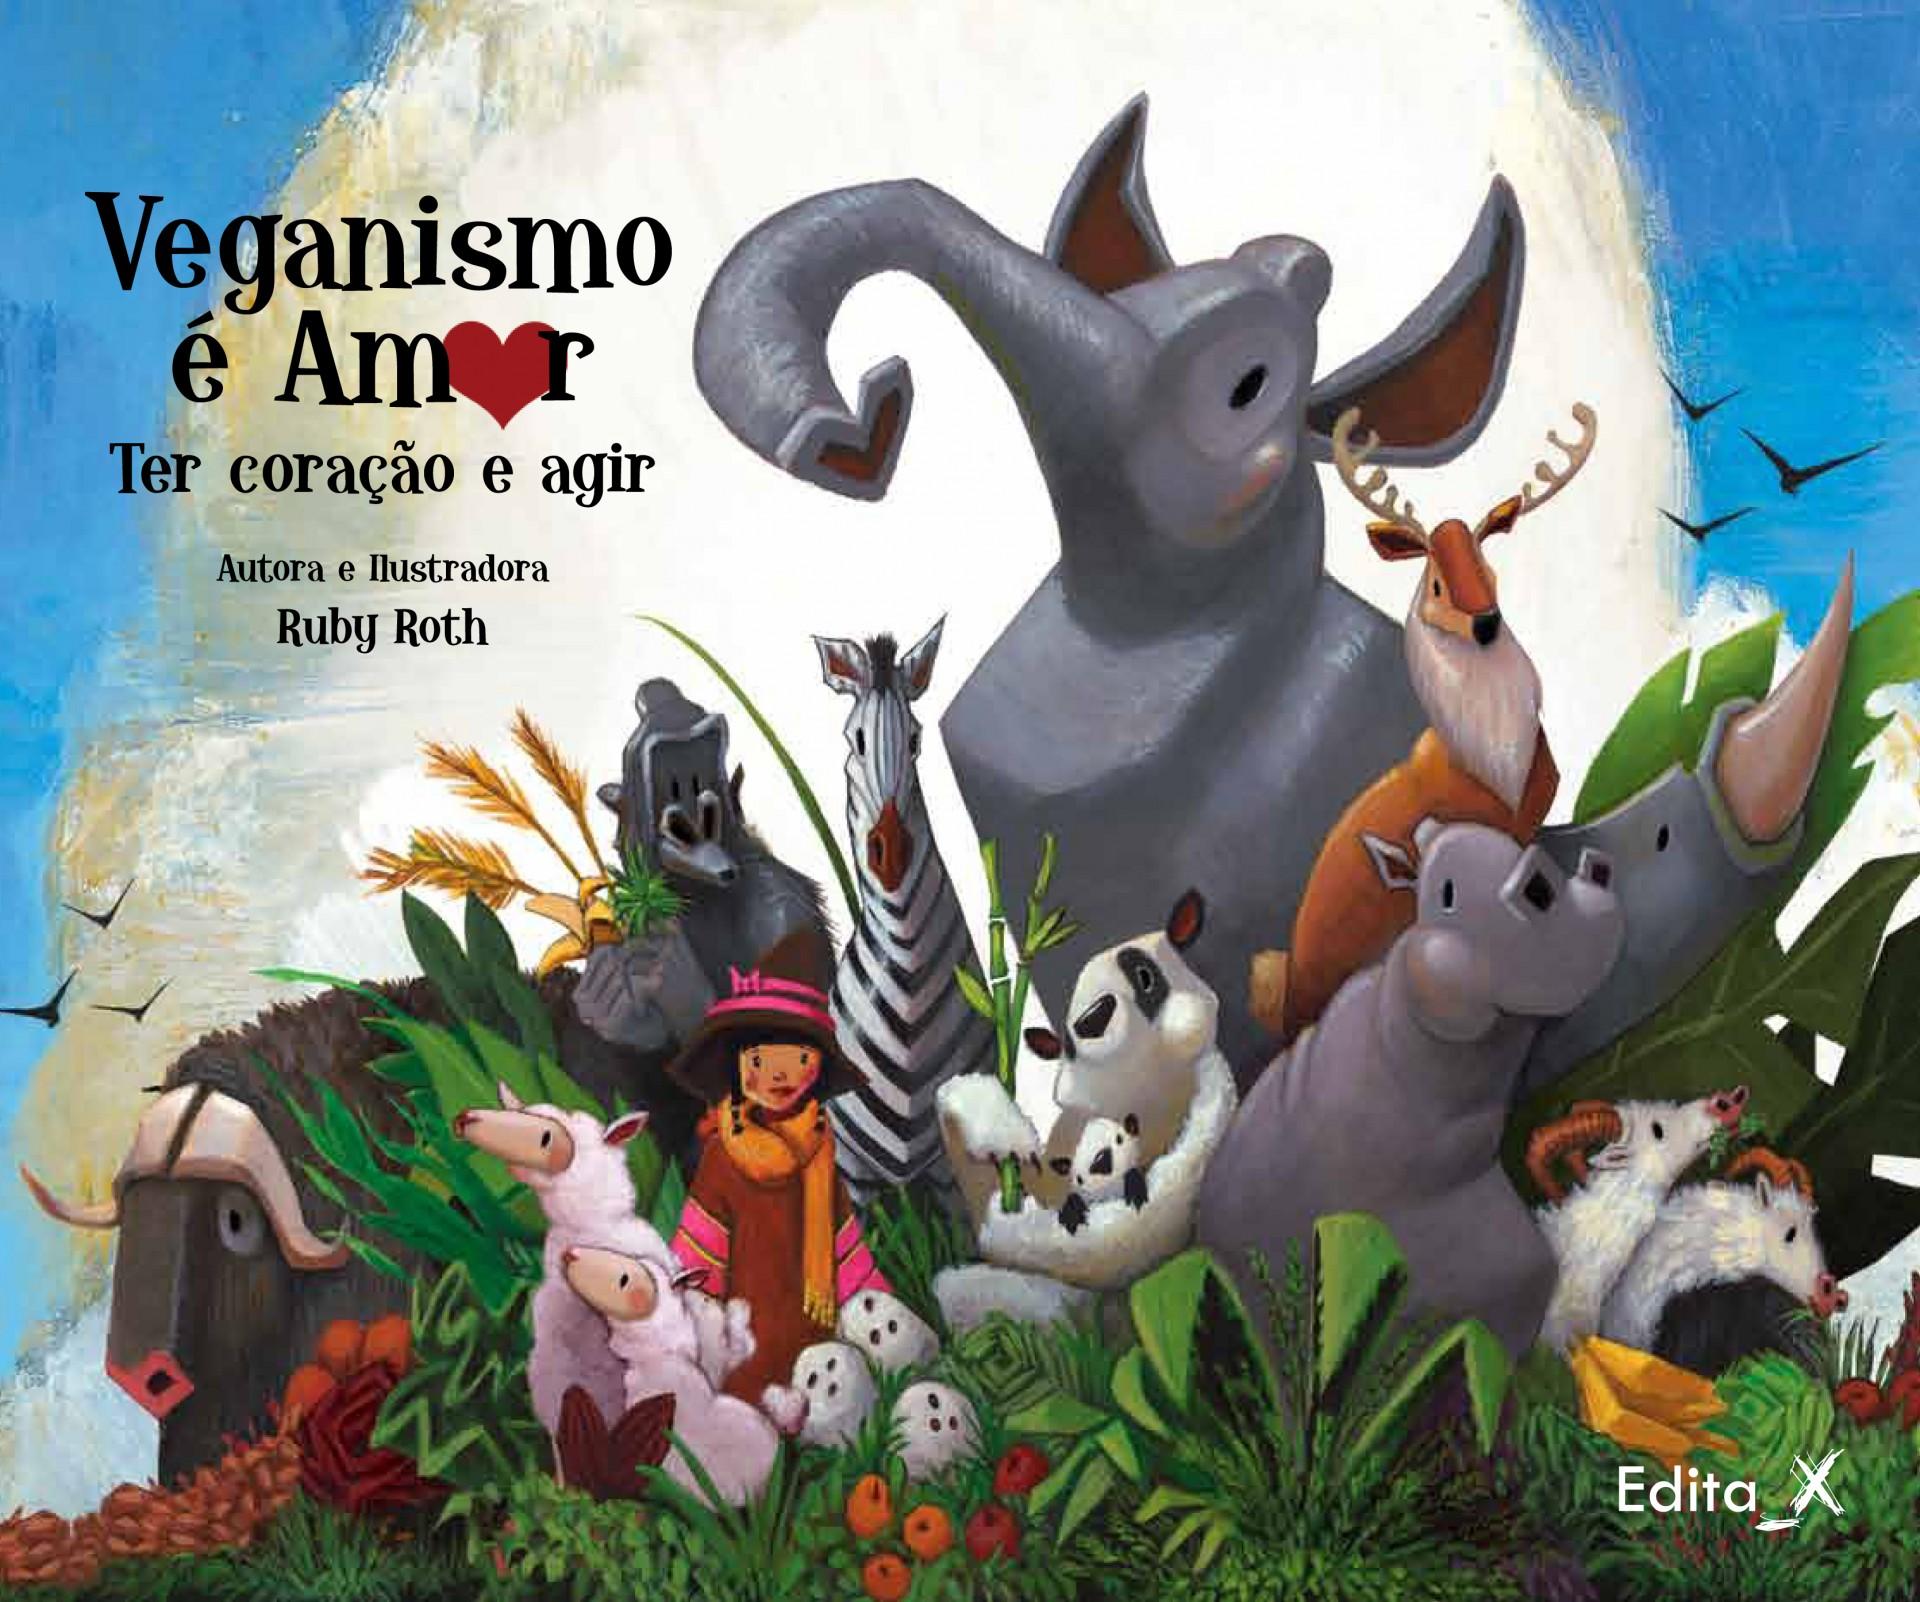 70388d4-veganismo_amor_capa_low